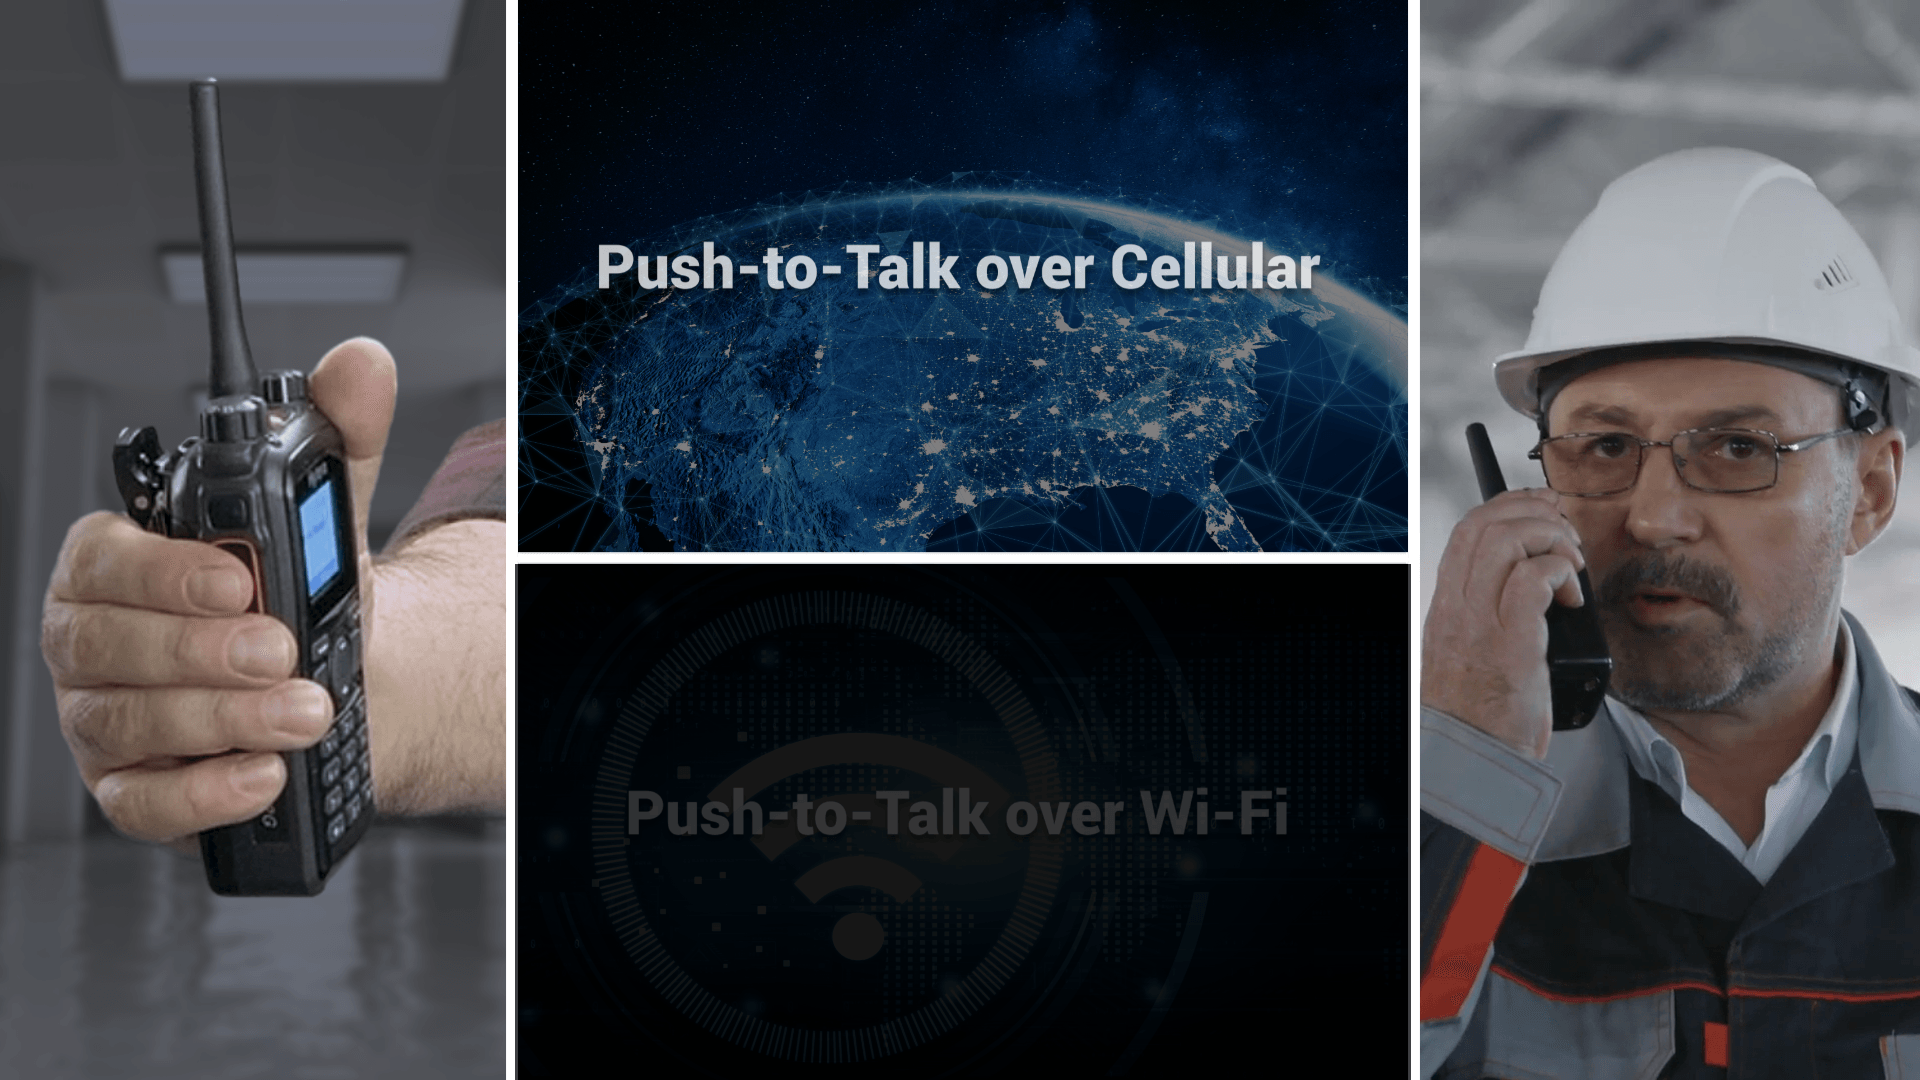 Push-to-Talk over Cellular (PoC)